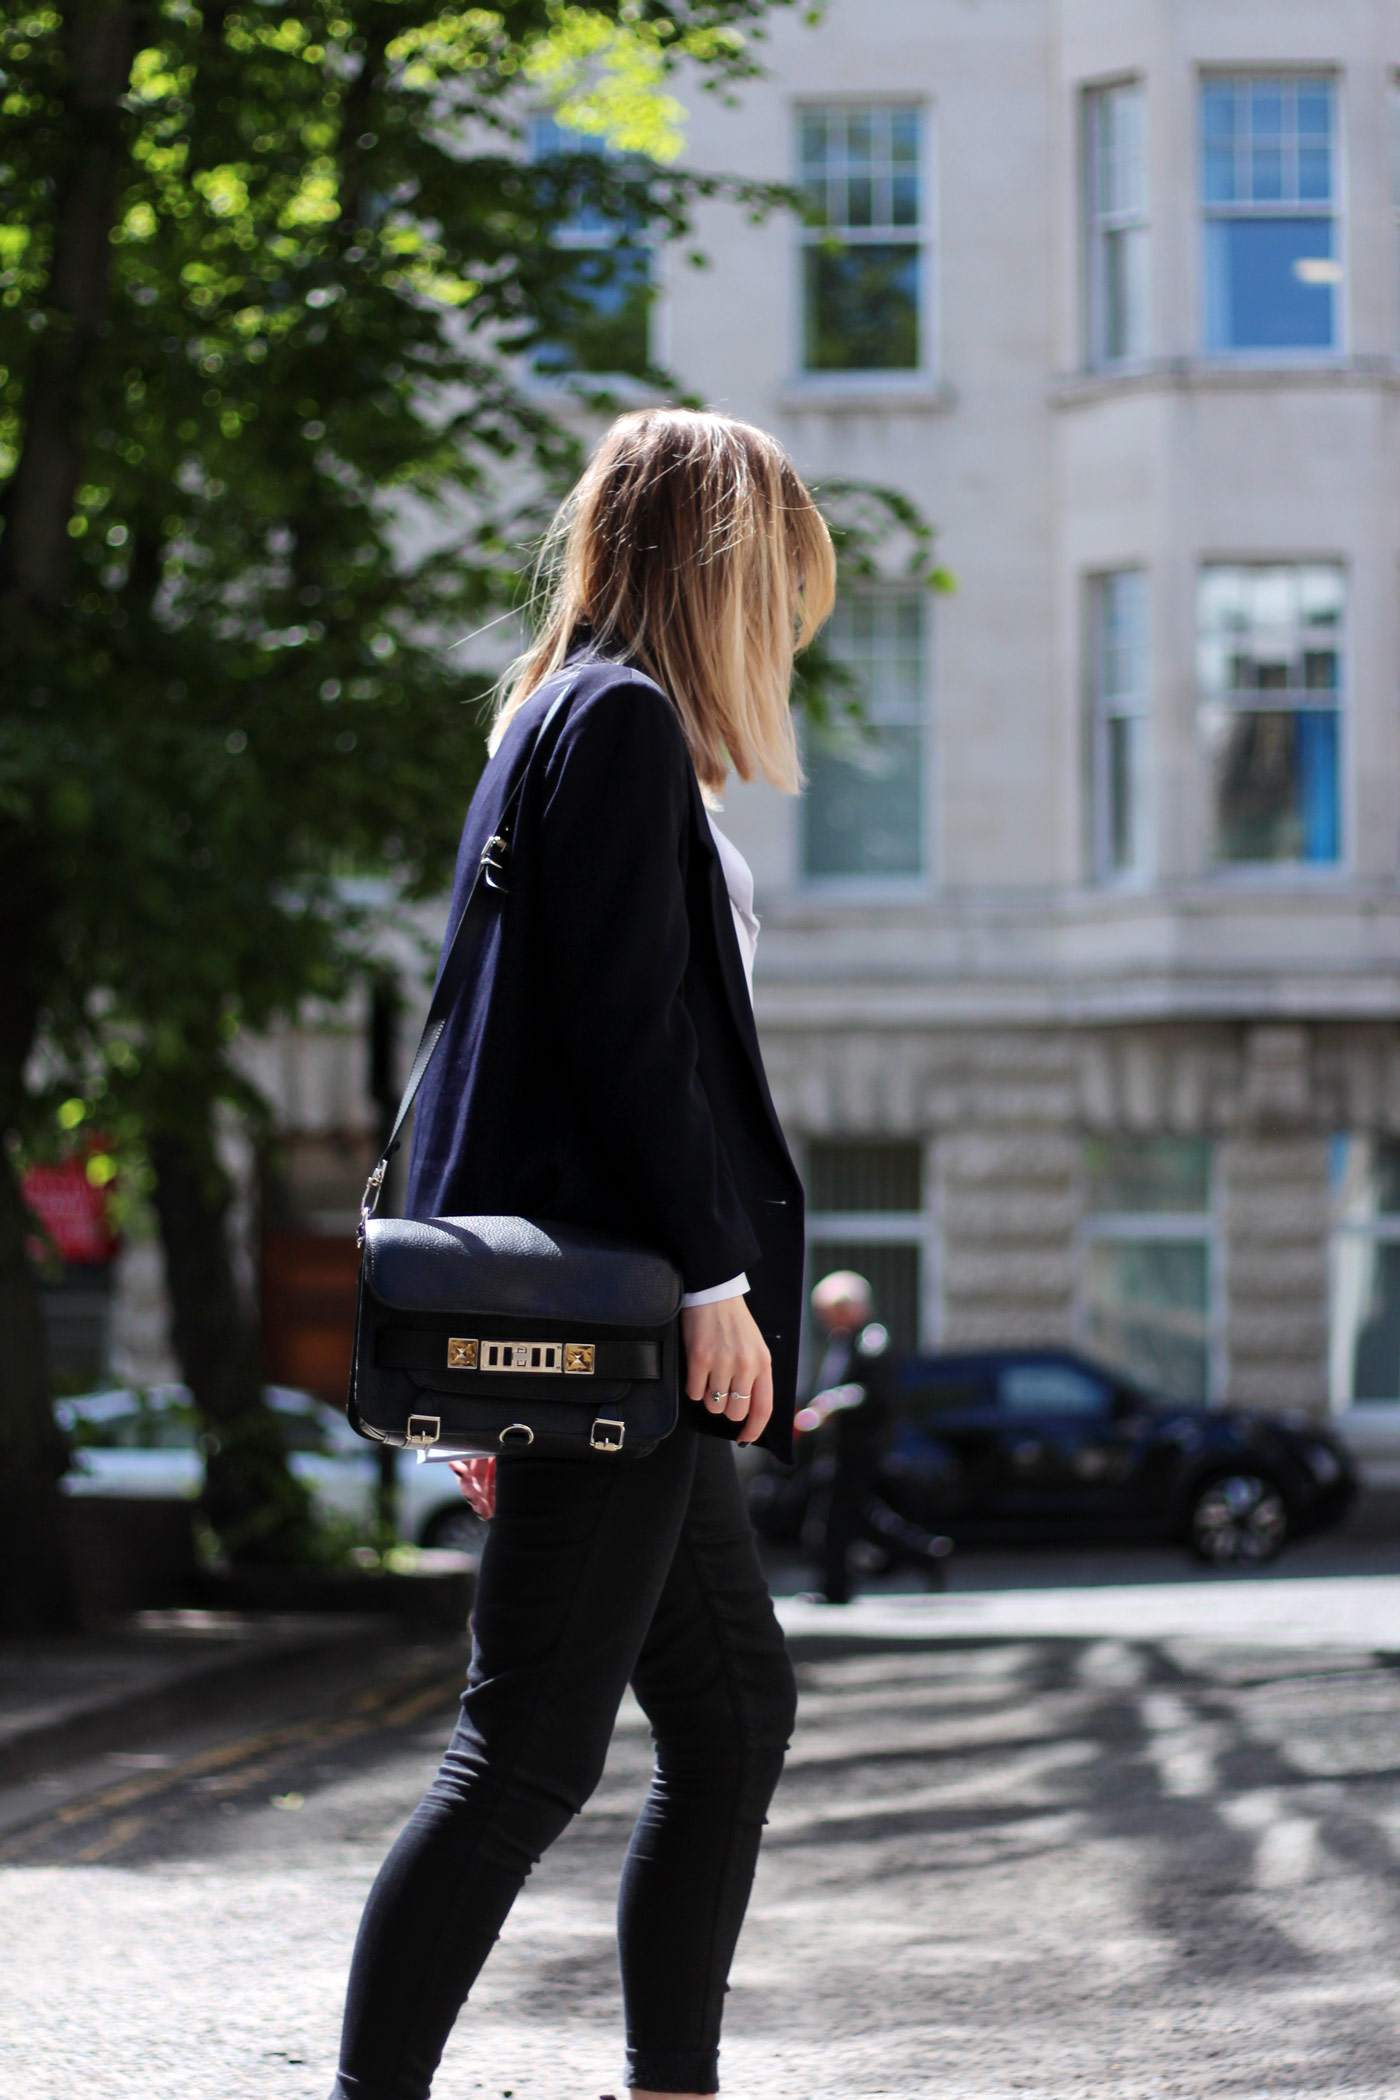 acne-jensen-boots-M&S-alexa-chung-ada-blazer-outfit-7